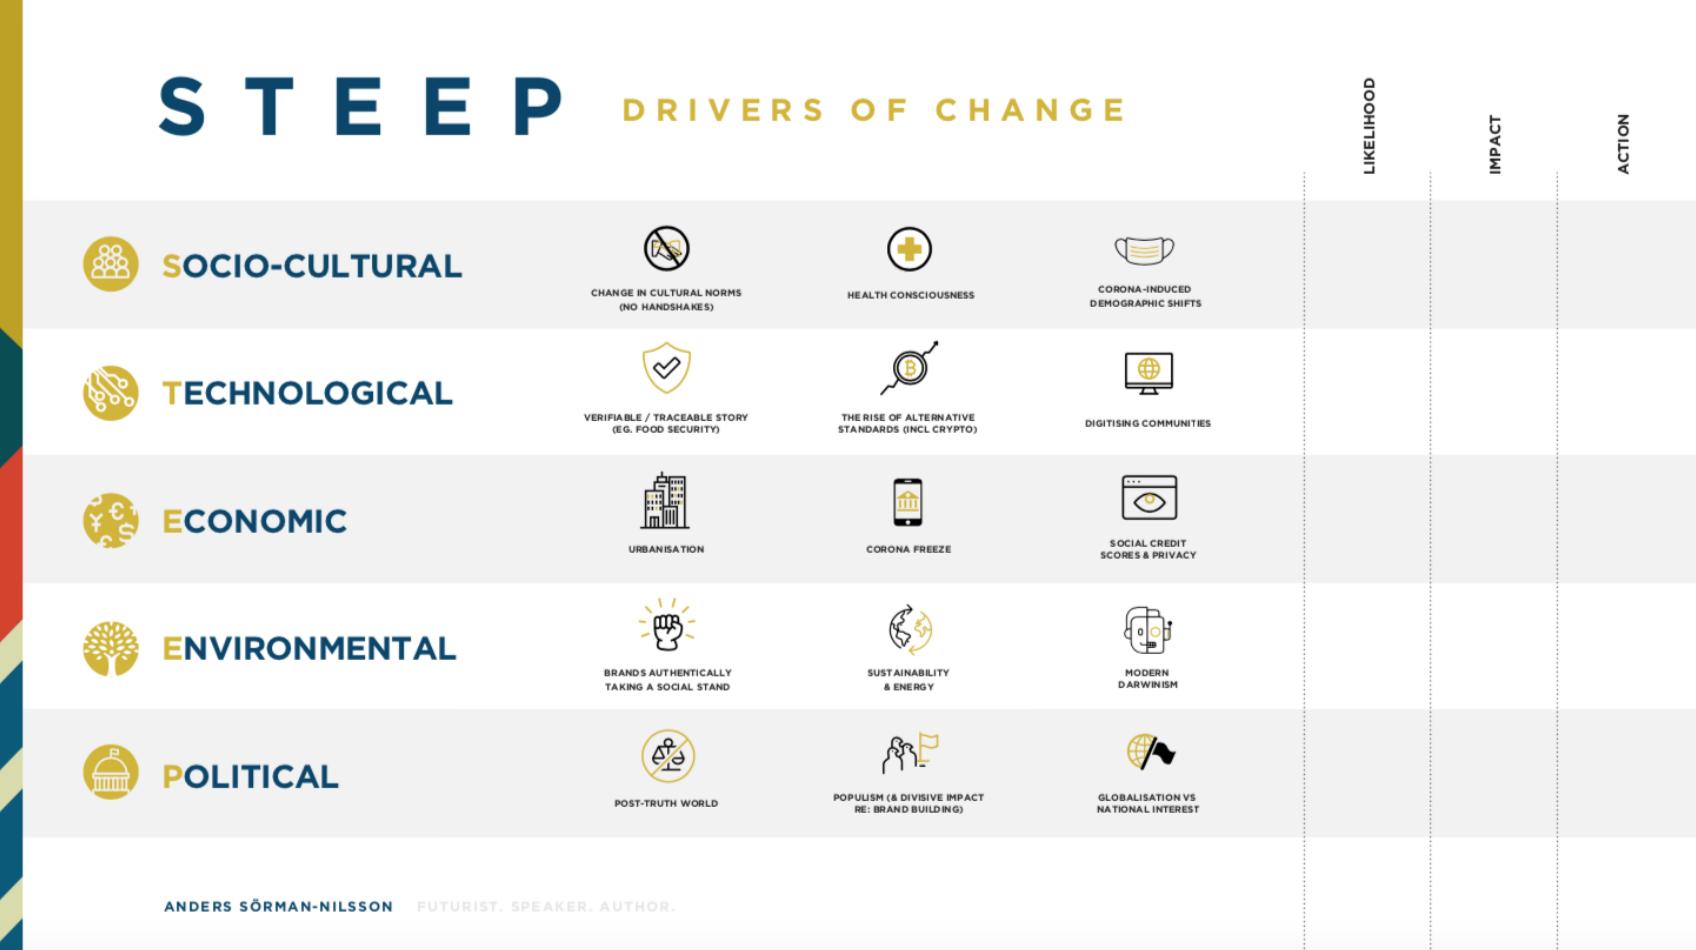 STEEP Trend Analysis Futurist Anders Sorman-Nilsson